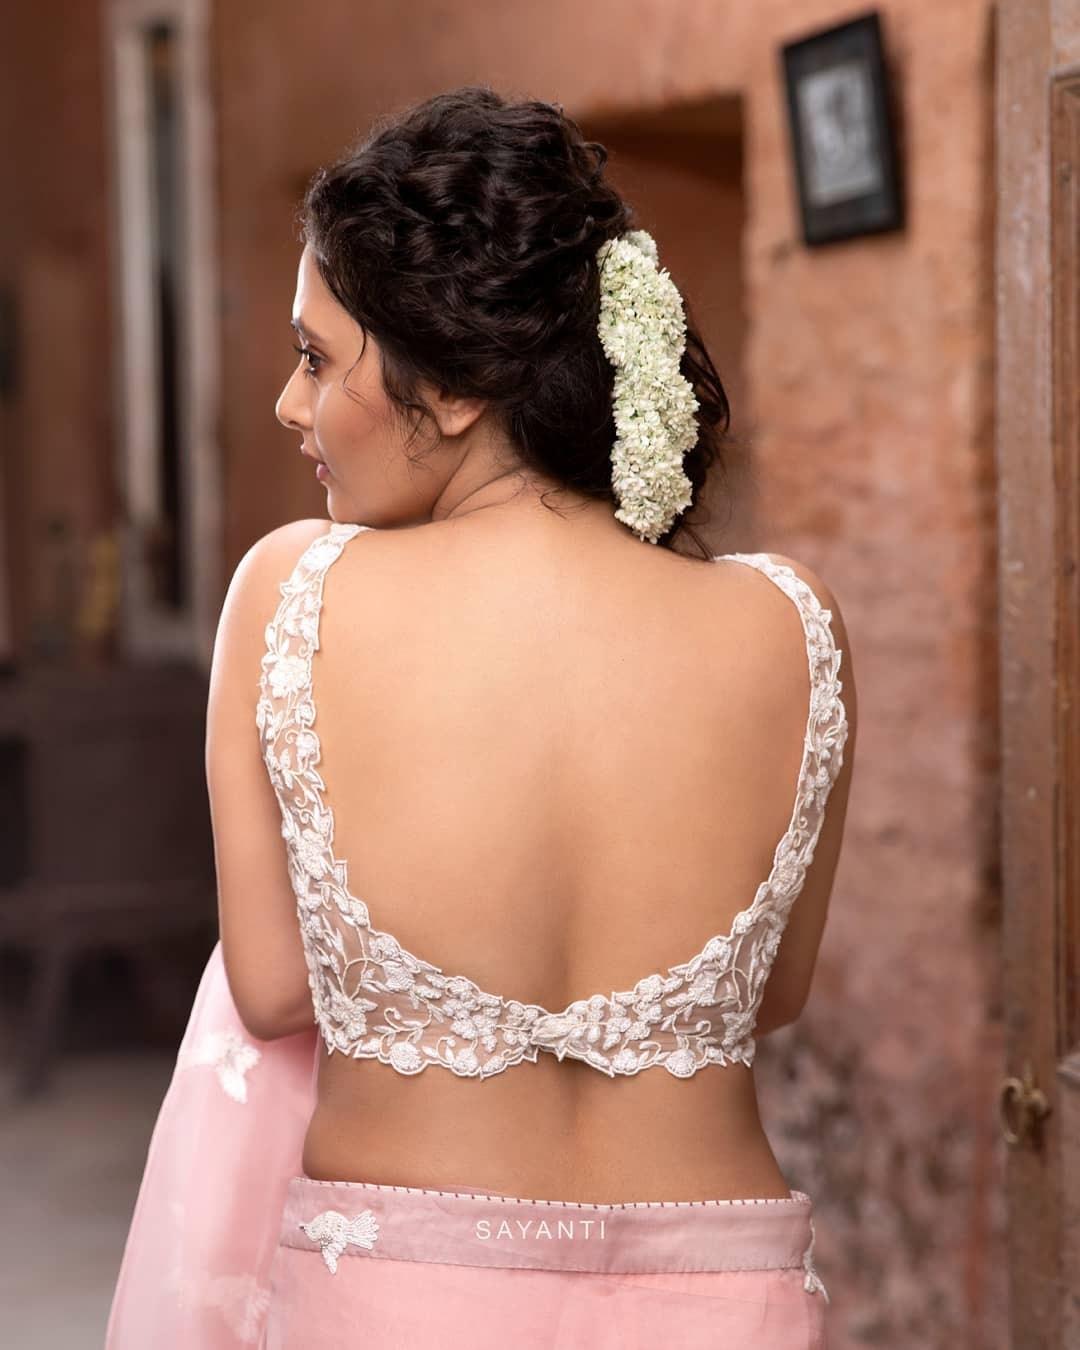 Cut dana embroidery blouse-Sayanti ghosh-1